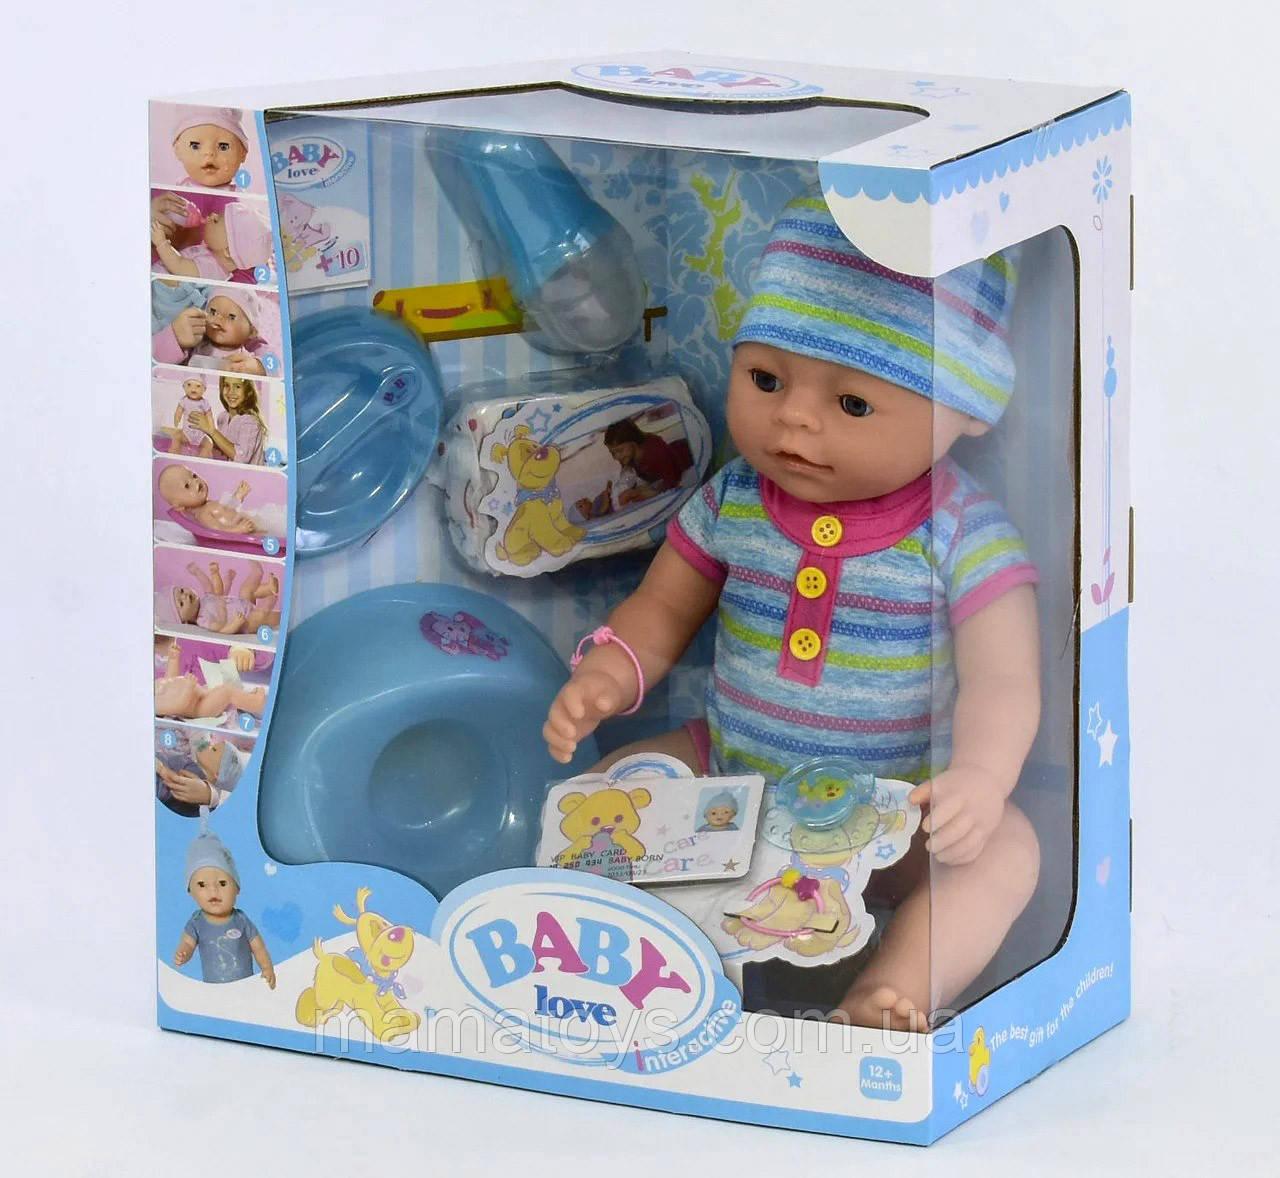 Кукла Baby. Беби Пупс BL 033 B  42 см, горшок, подгузник, соска, тарелка, каша